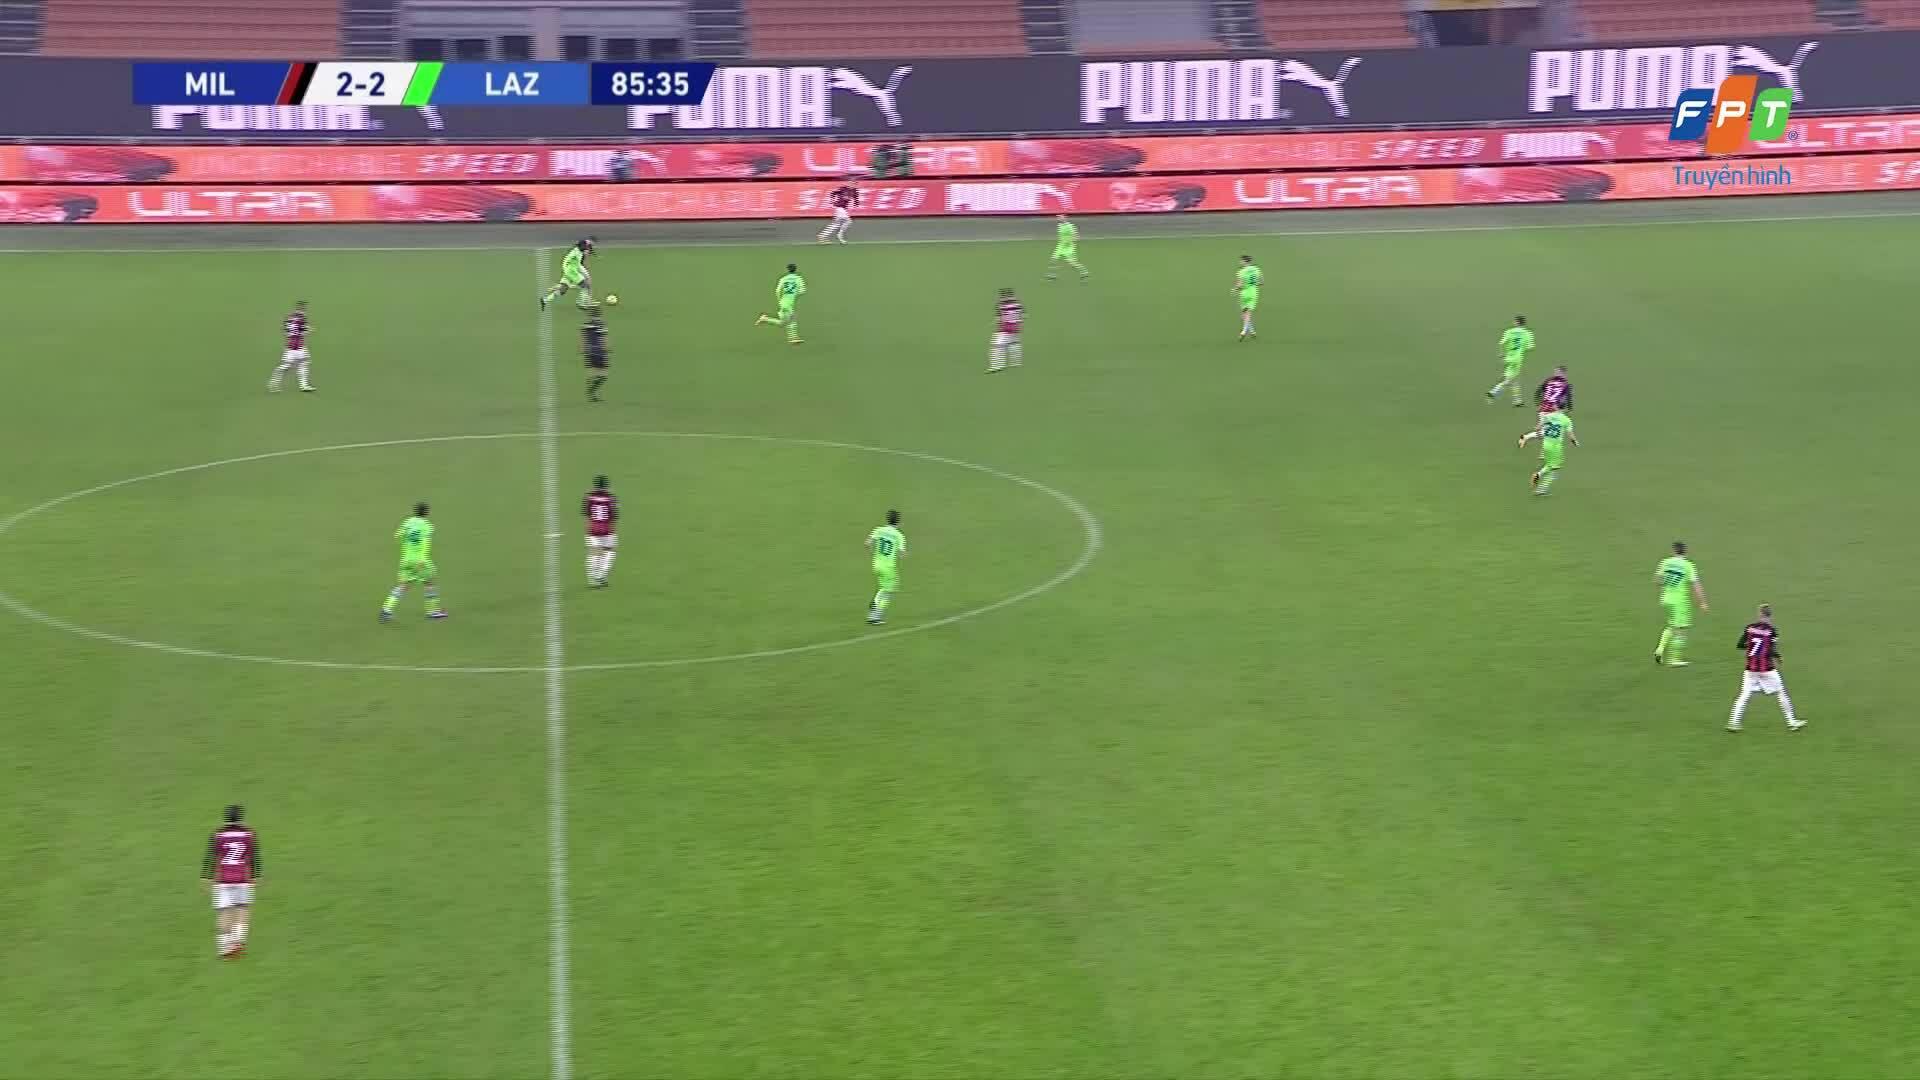 AC Milan 3-2 Lazio